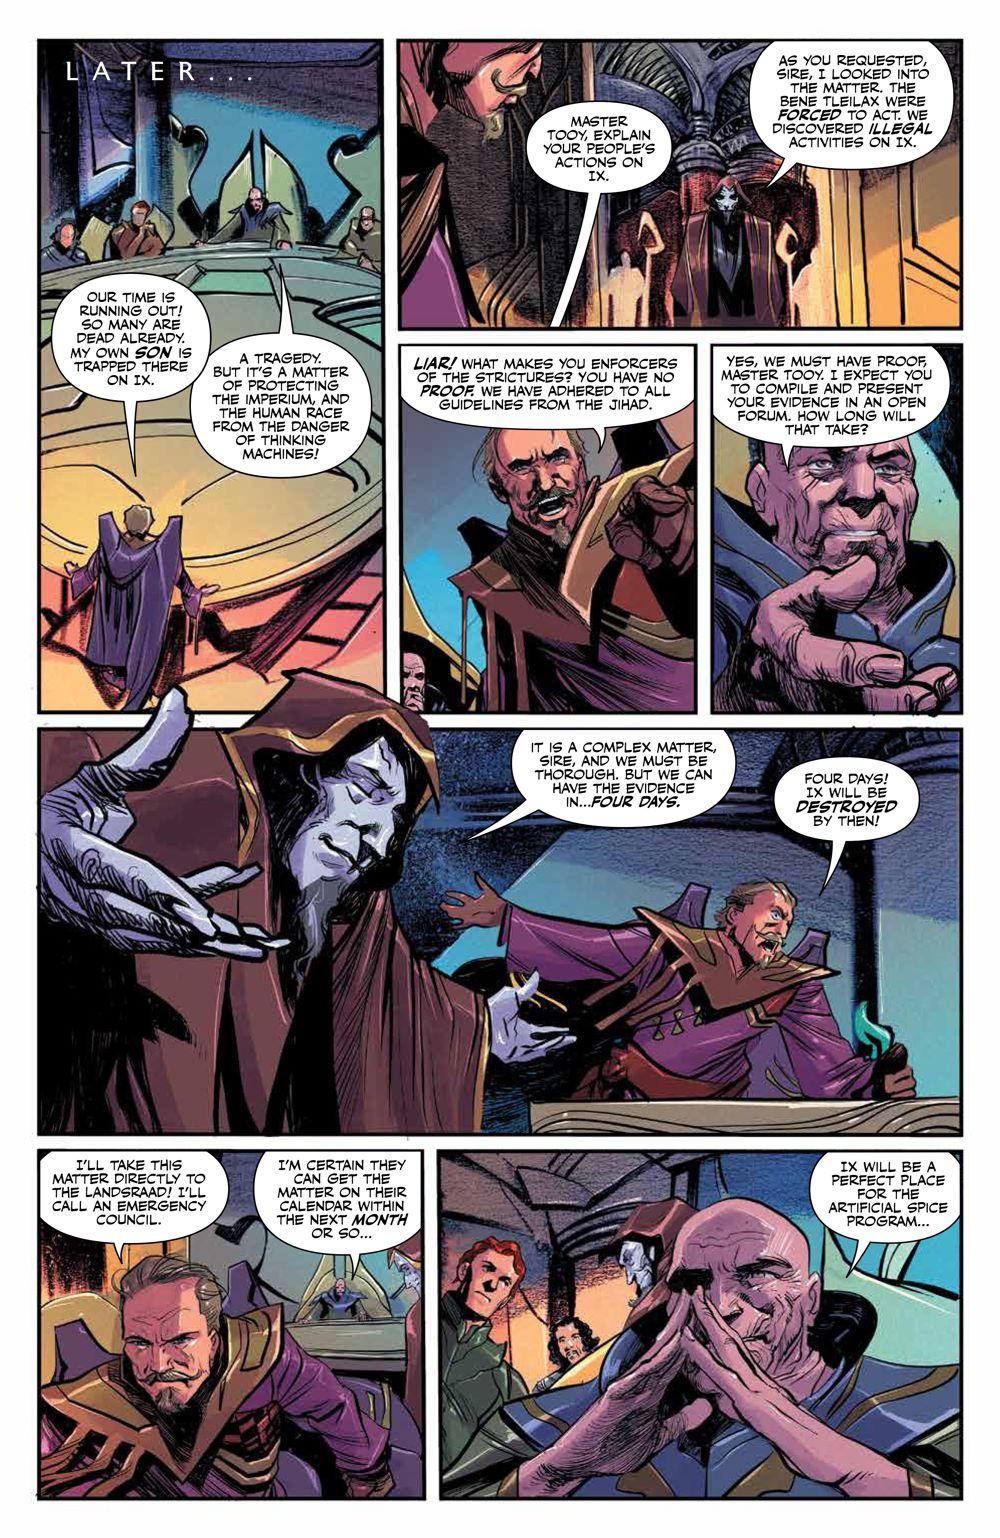 Dune_HouseAtreides_006_PRESS_7 ComicList Previews: DUNE HOUSE ATREIDES #6 (OF 12)